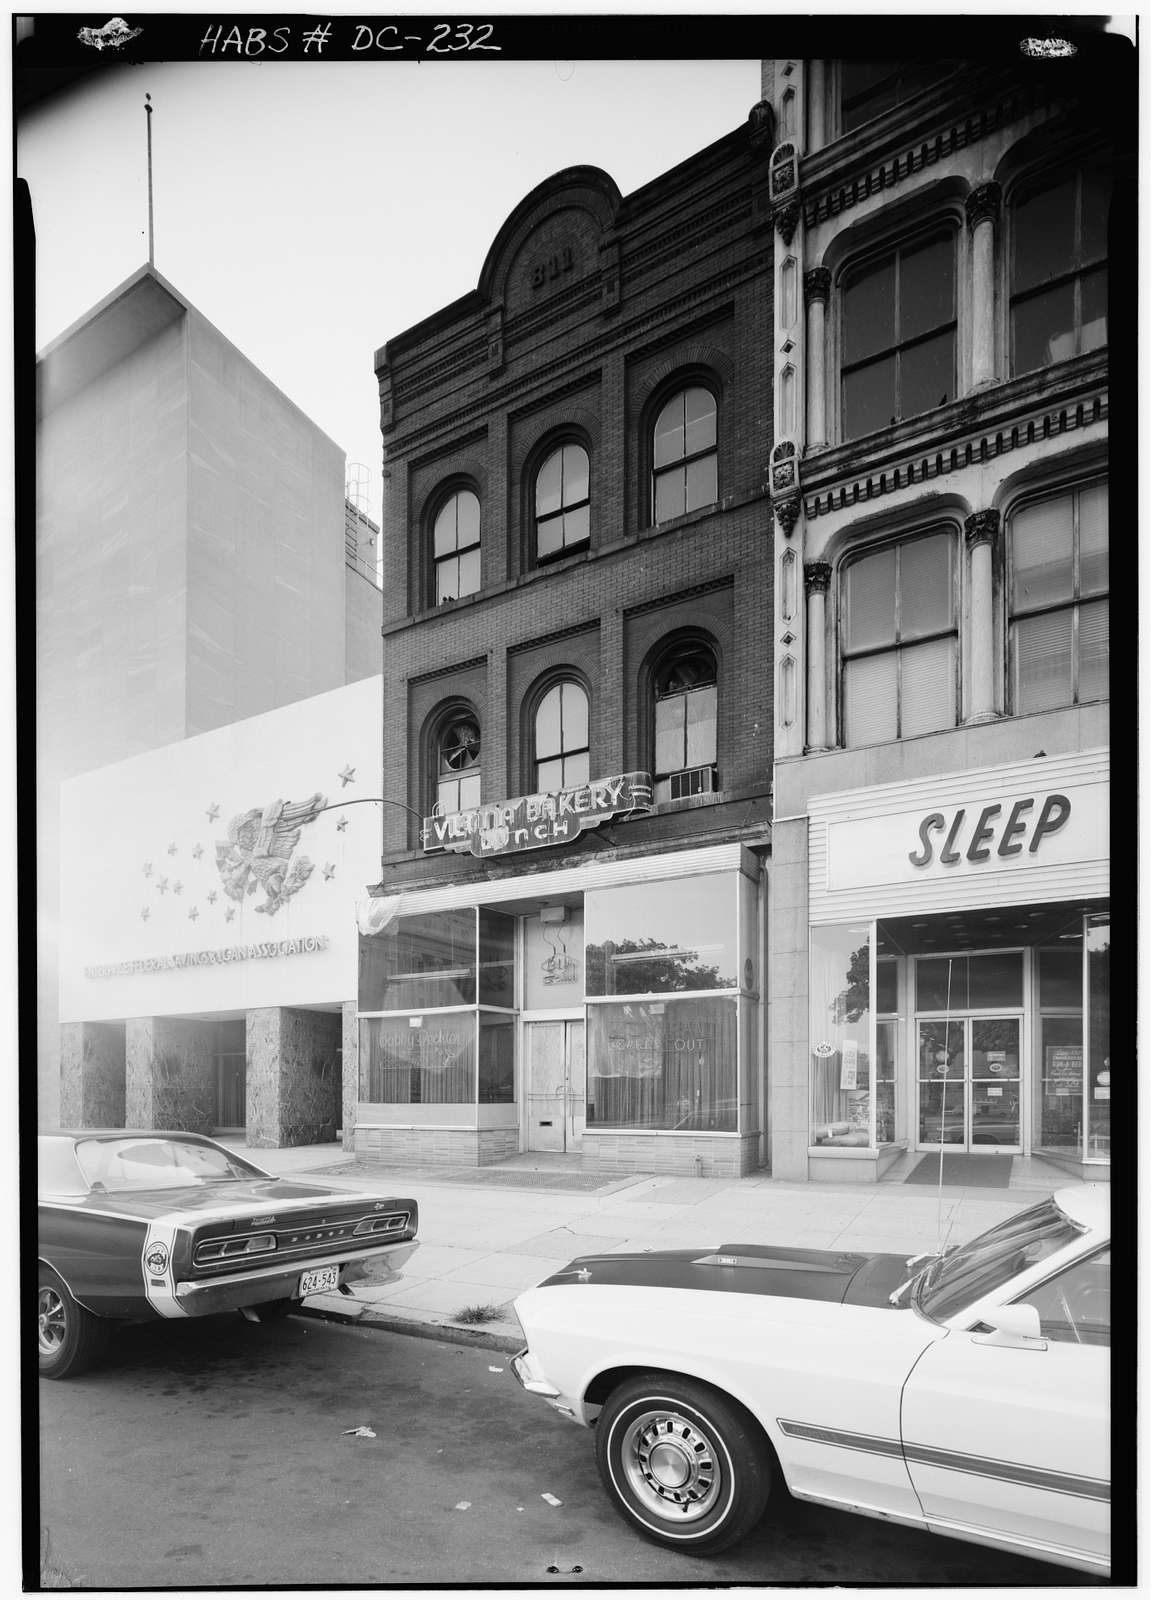 811 Market Space Northwest (Commercial Building), Square 408, Lot 803, Washington, District of Columbia, DC